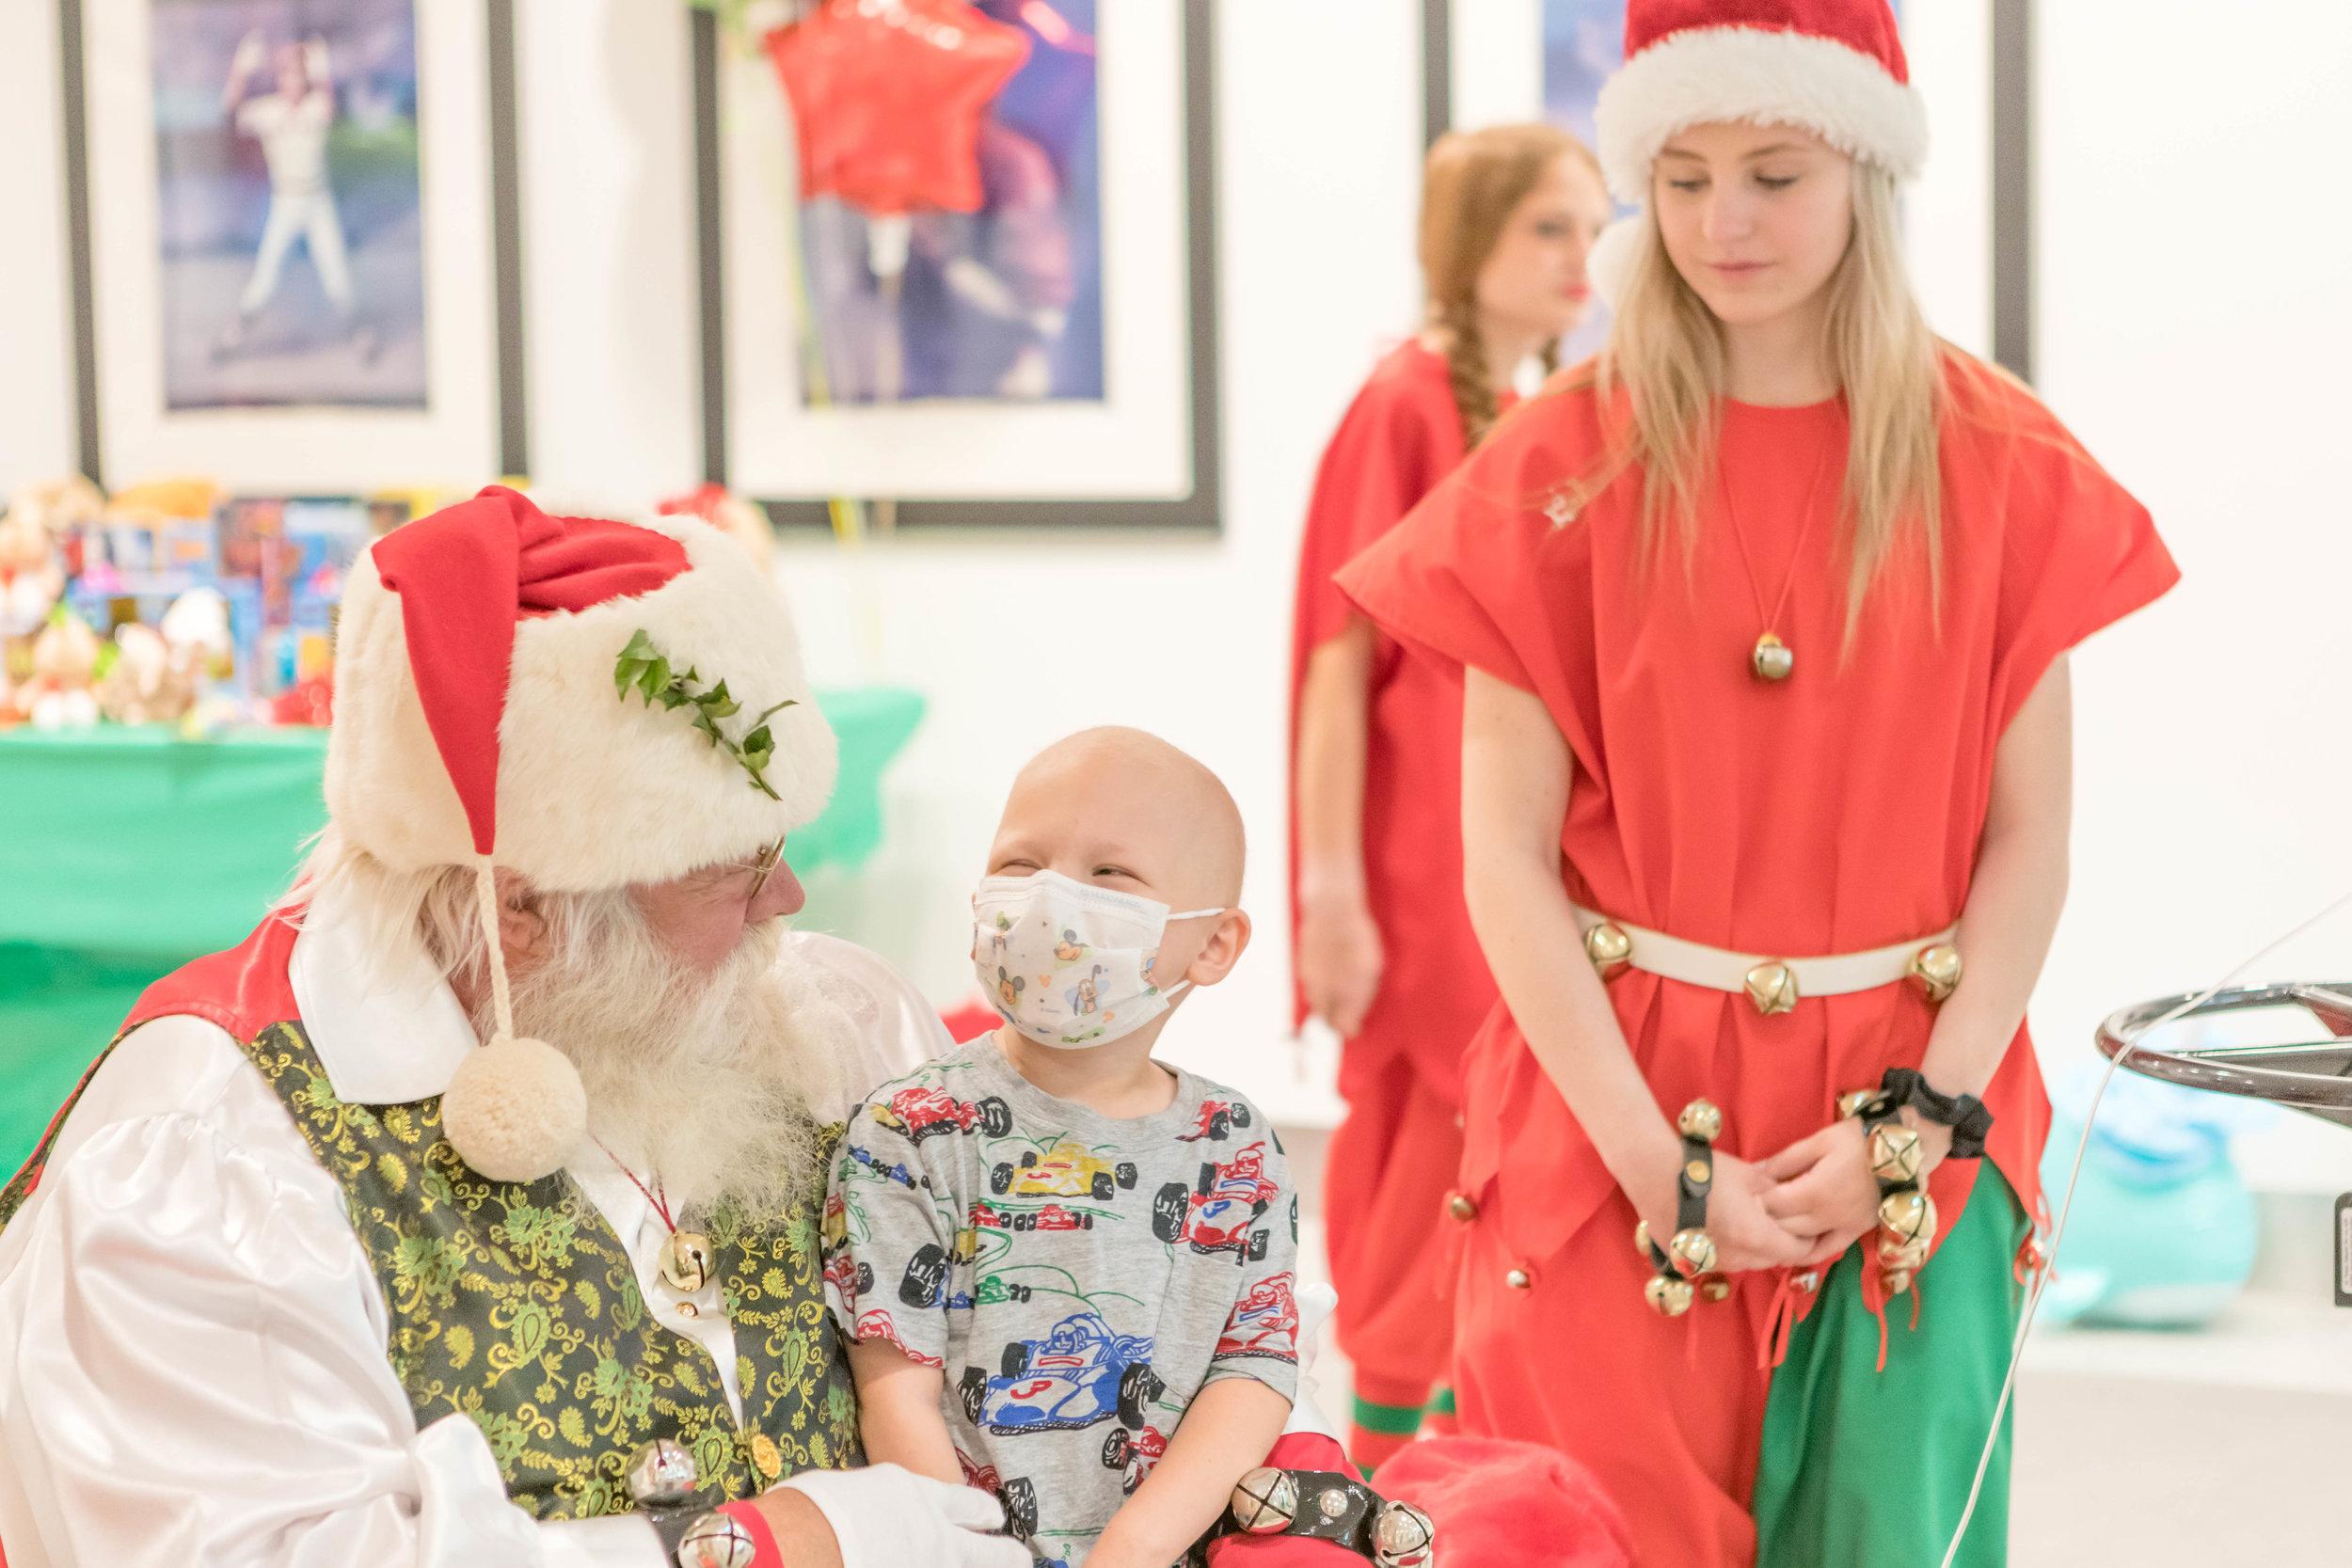 Santa visiting with children